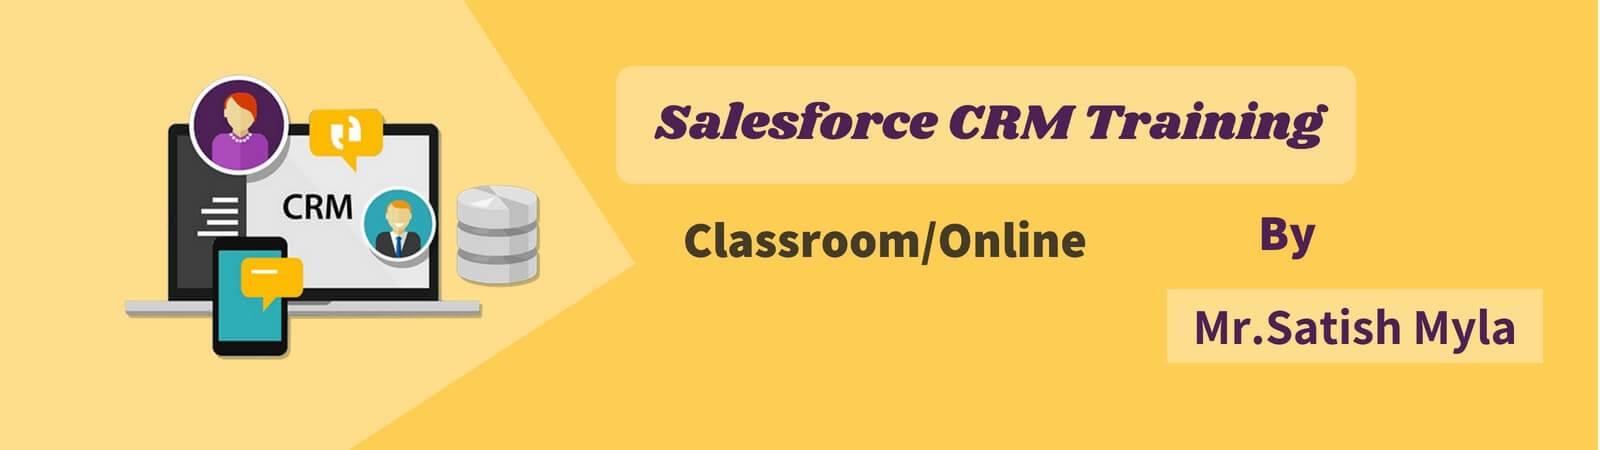 salesforce crm training